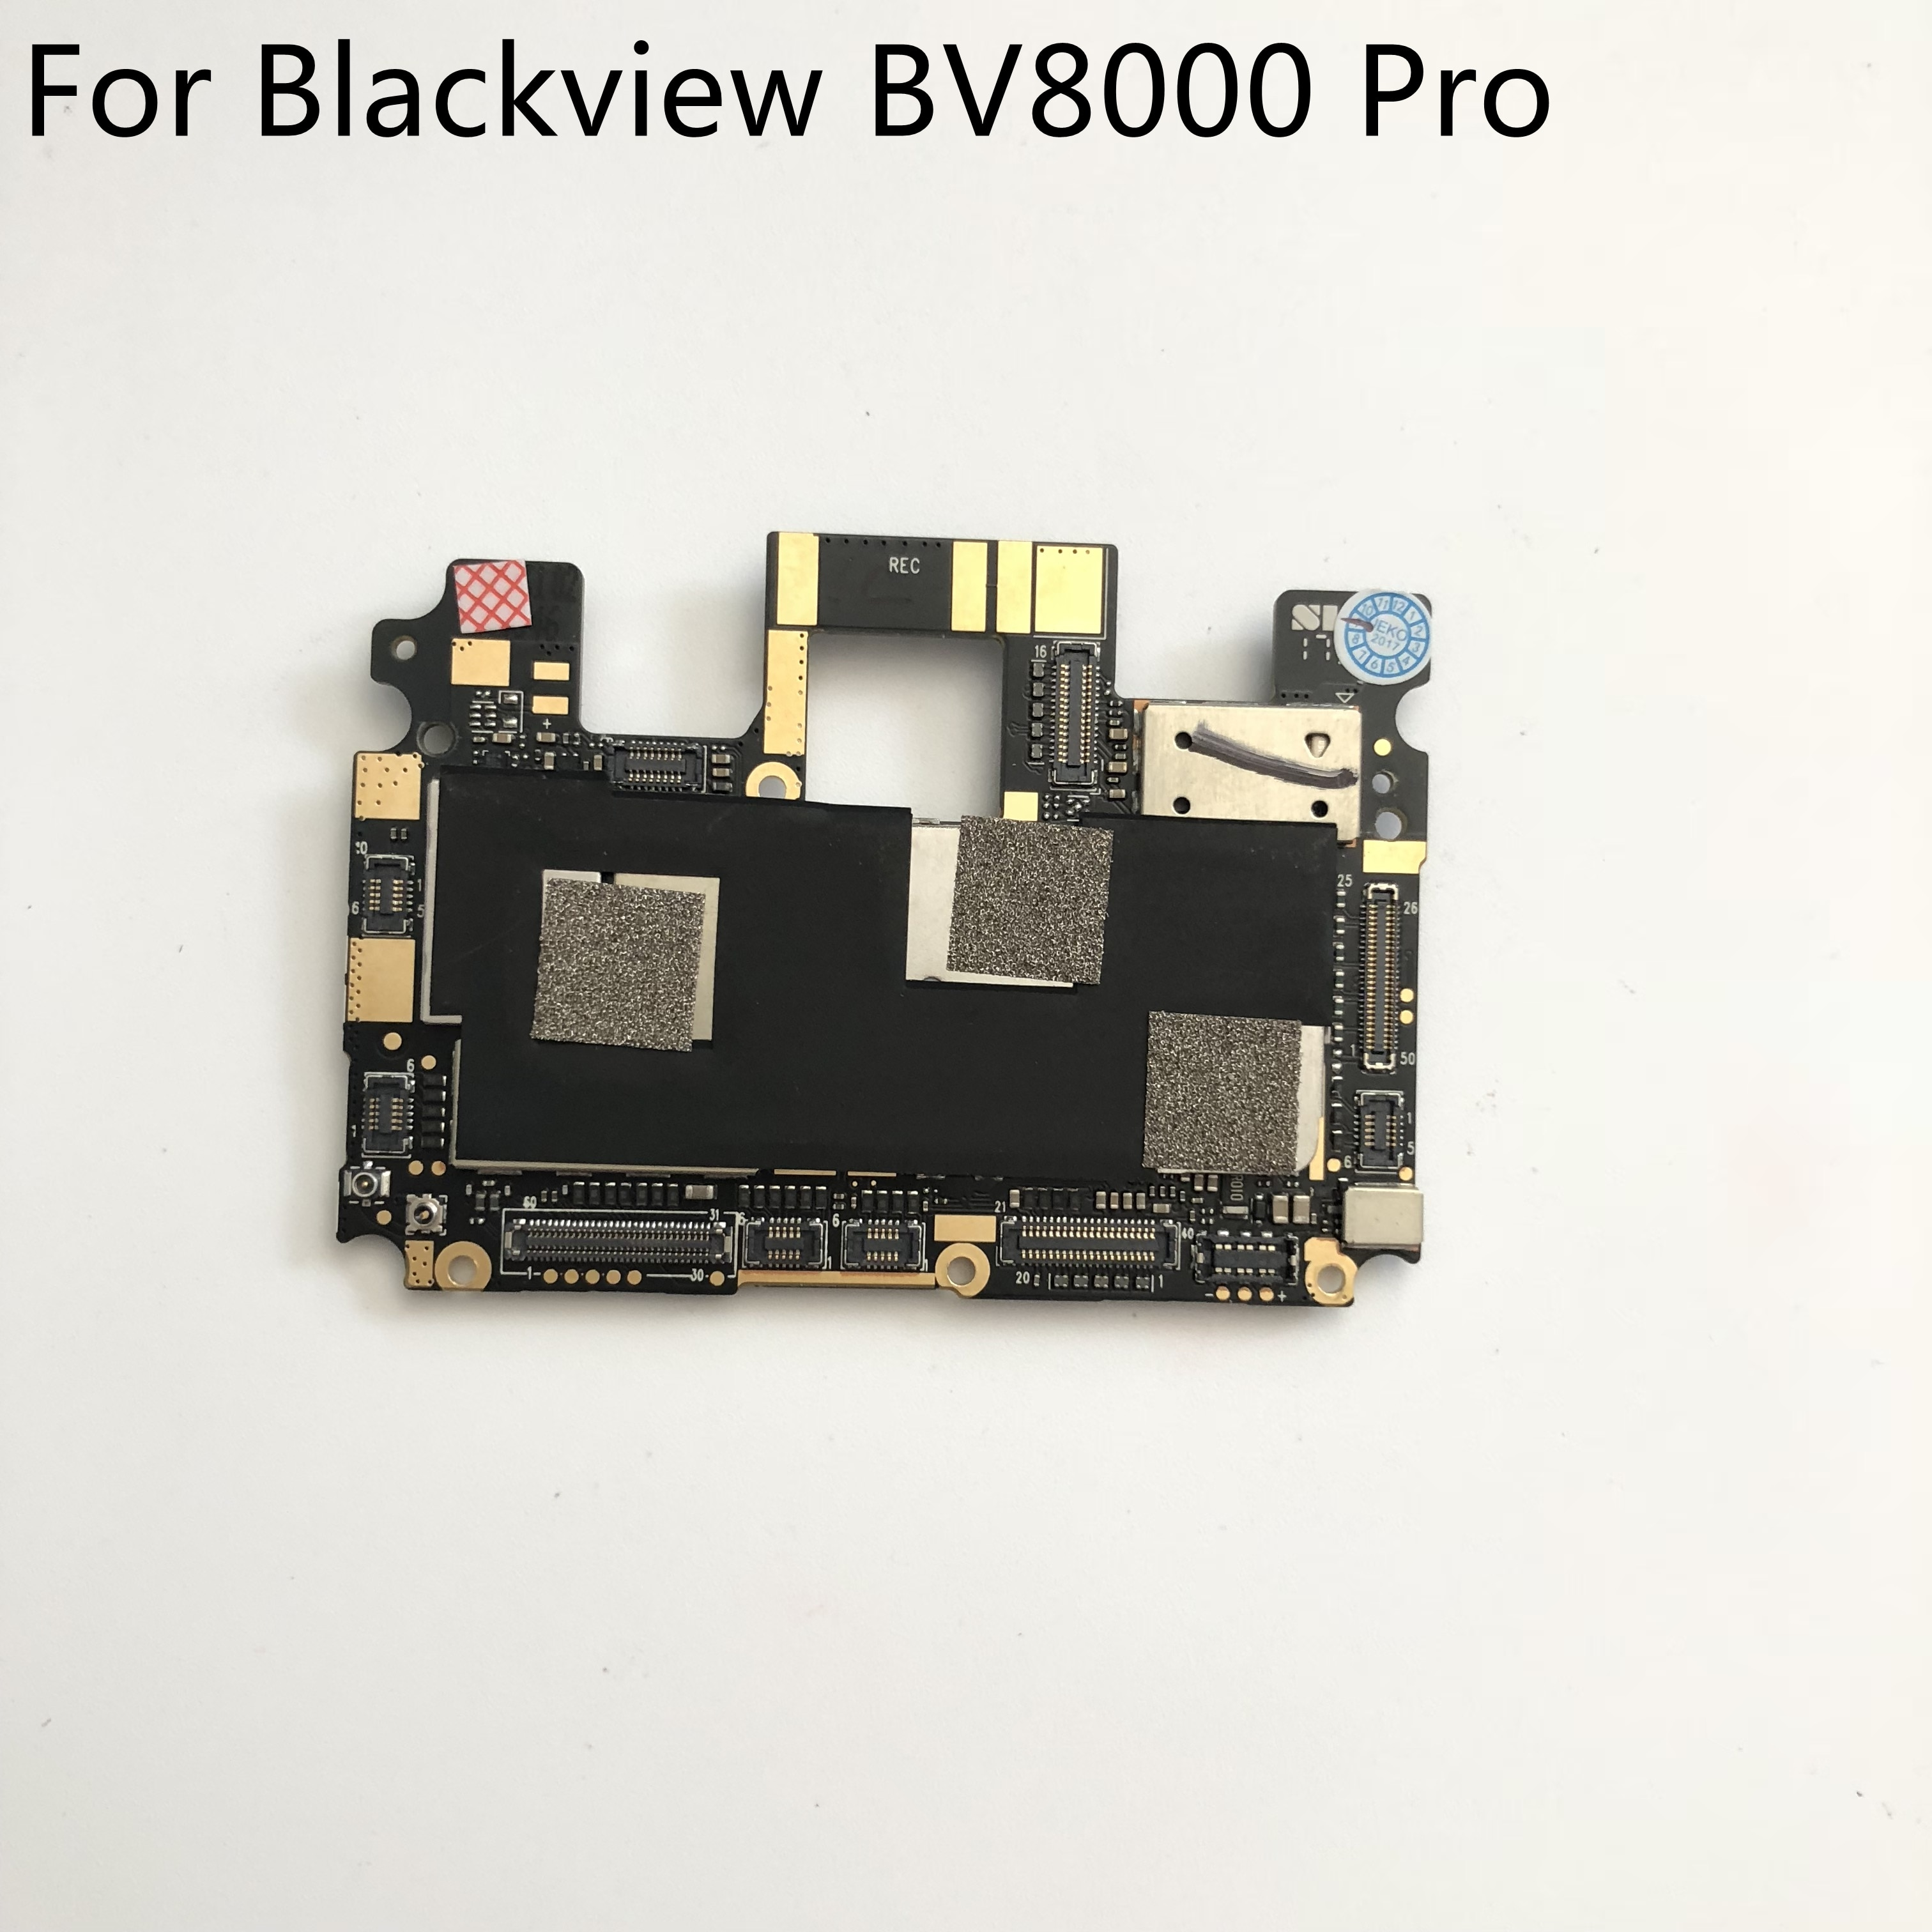 Placa base usada 6G RAM + 64G ROM placa base para Blackview BV8000 Pro MT6757 Octa Core 5,0 pulgadas 1920*1080